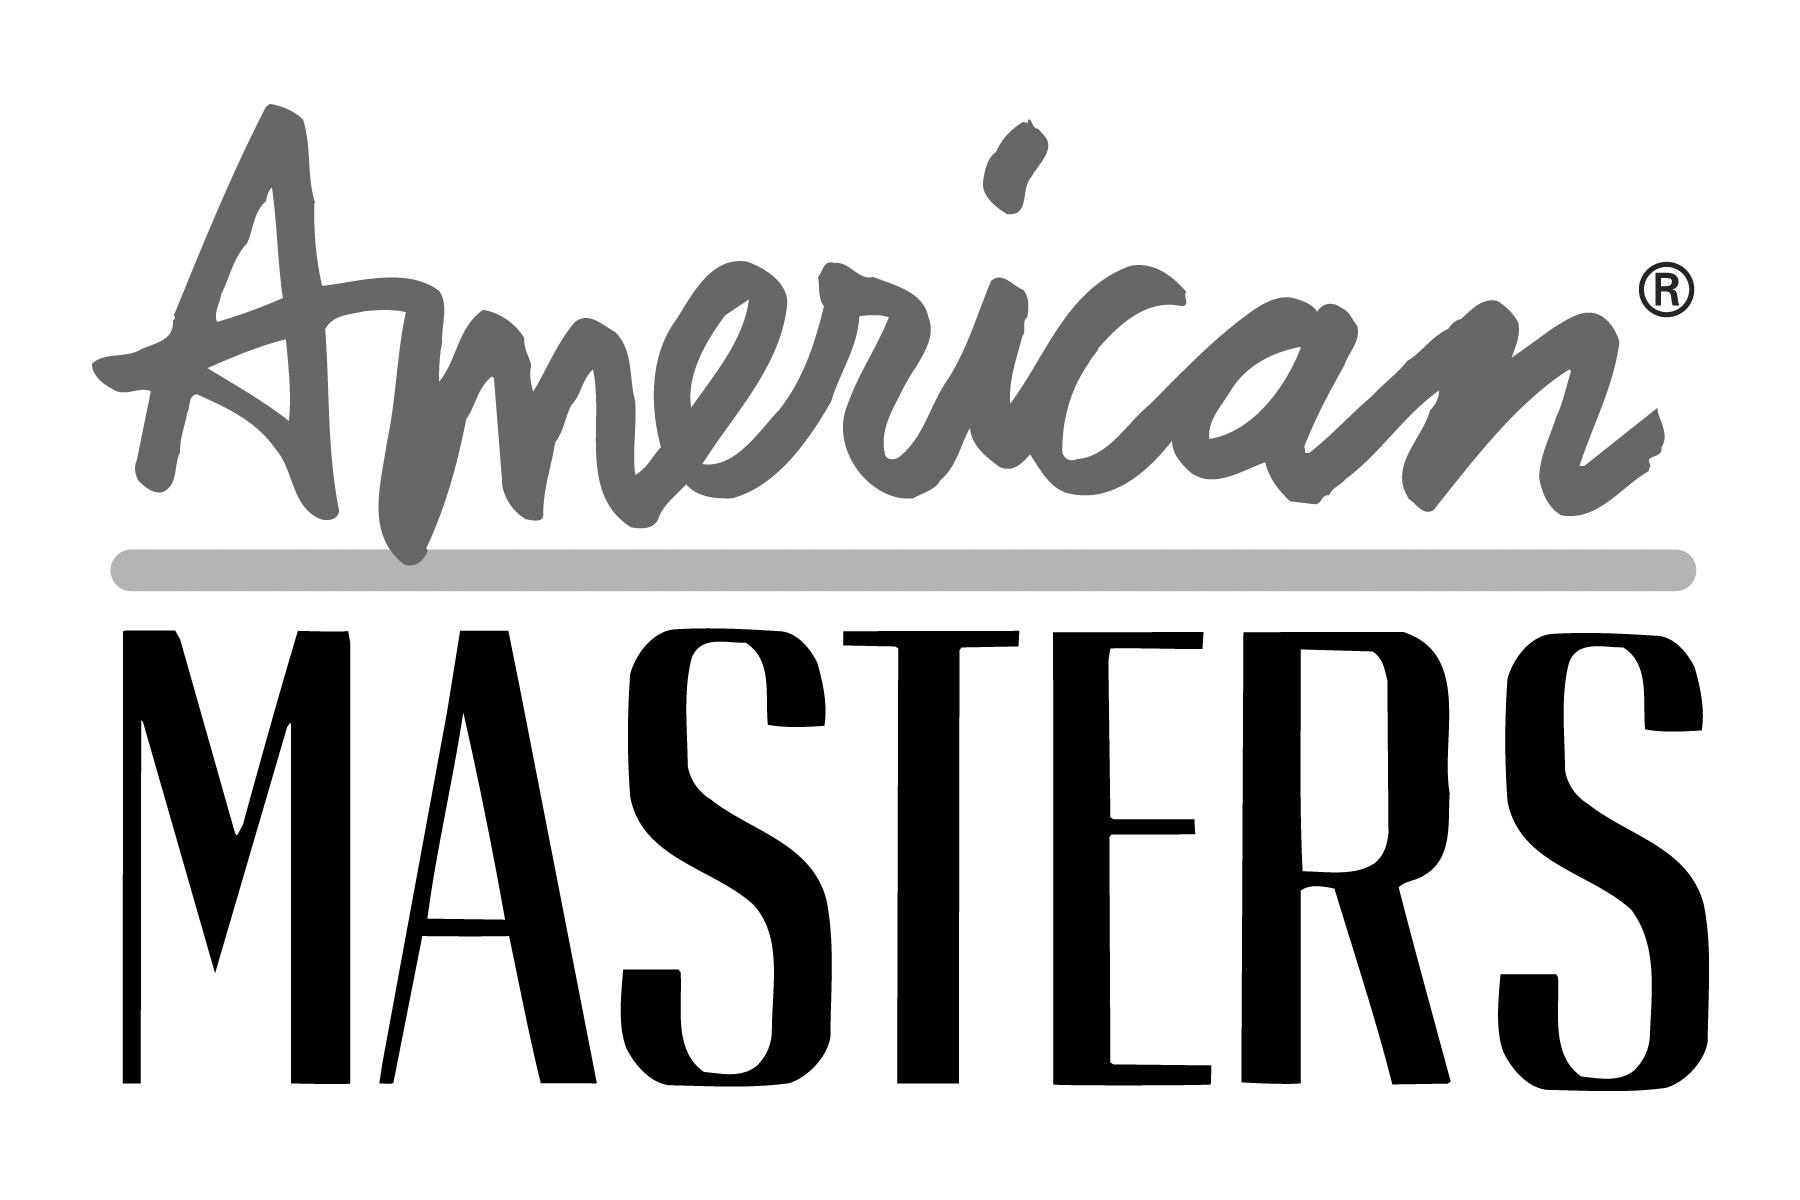 American Masters [TV Documentary Series]